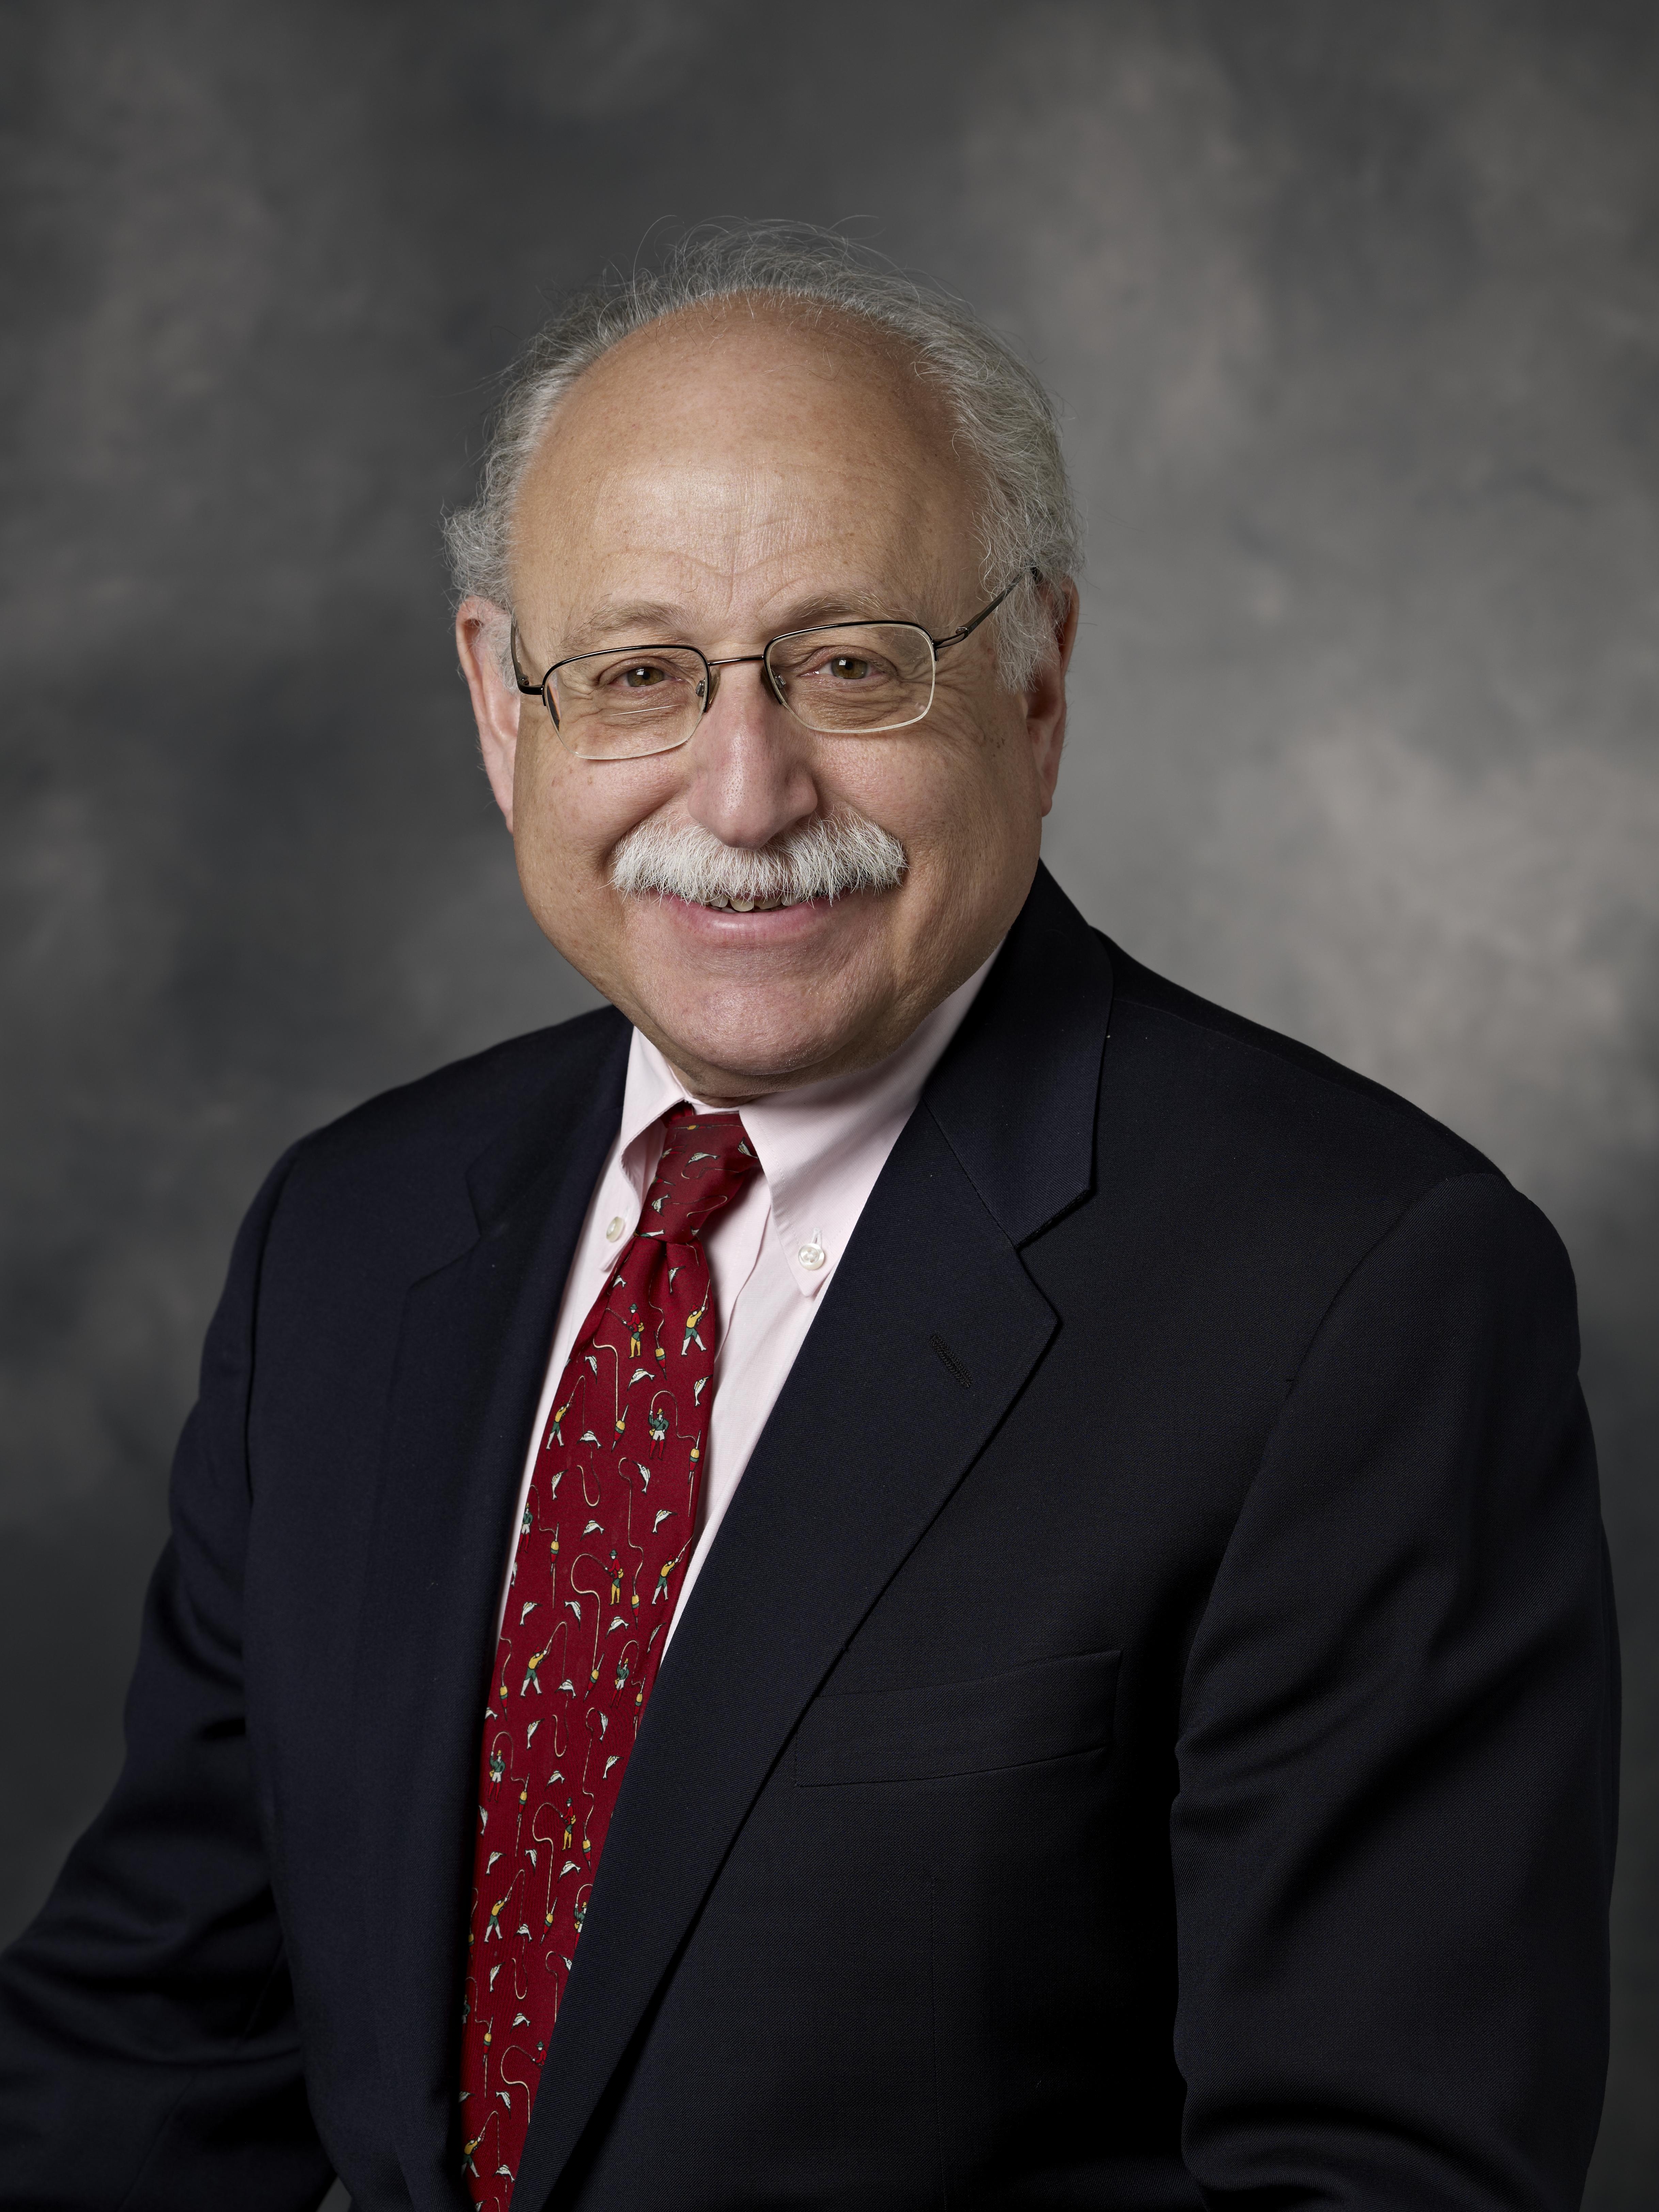 Alan F. Schatzberg, M.D.